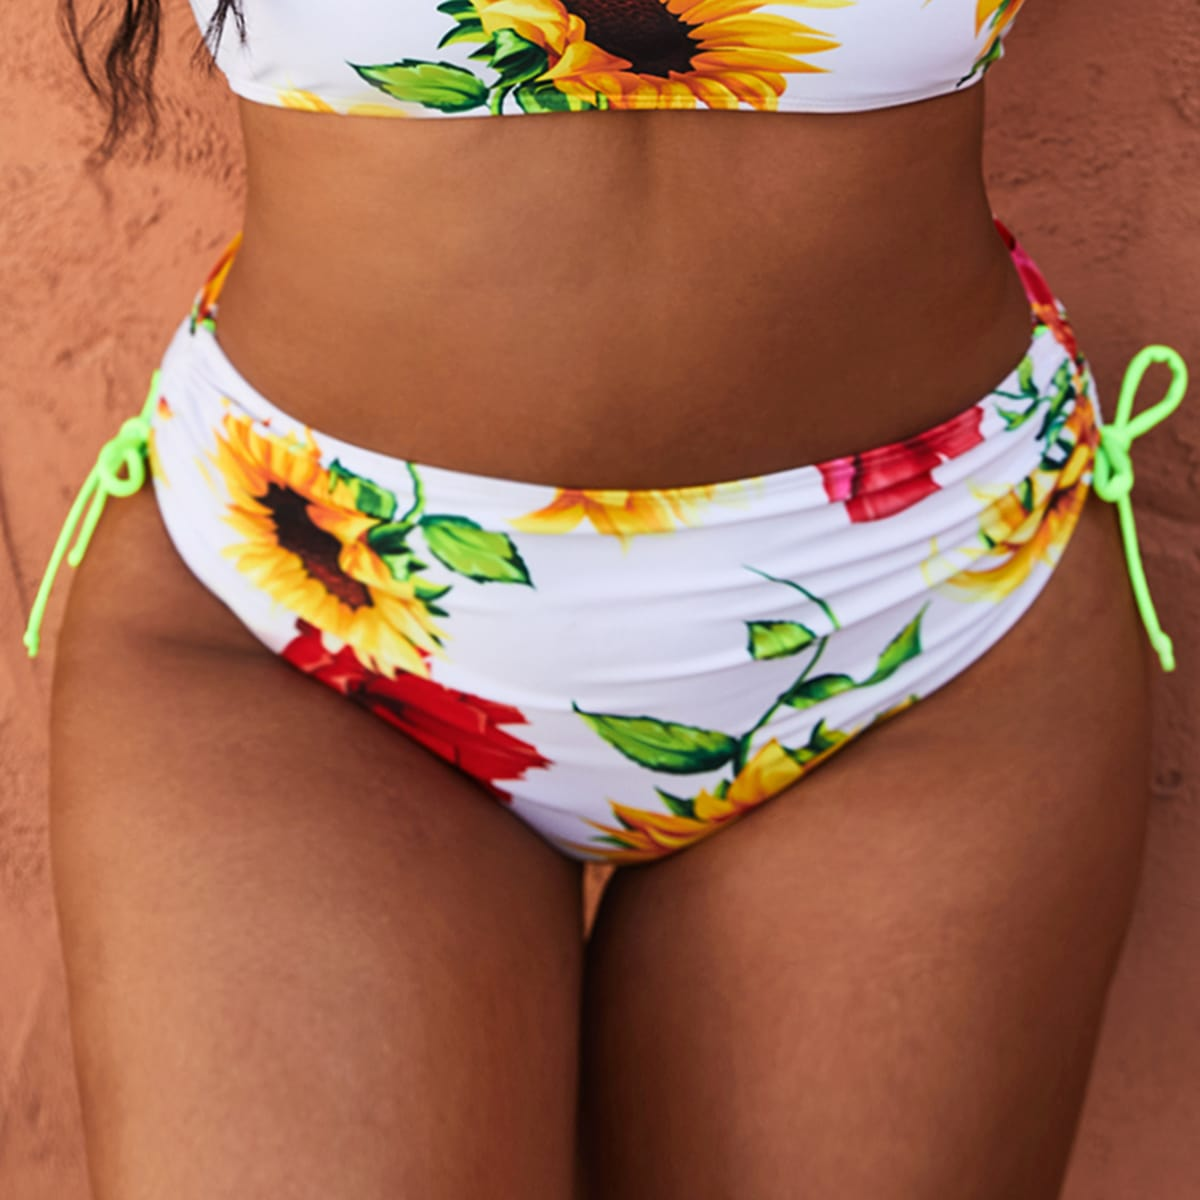 SHEIN Boho Bloemen Grote maat bikini bottom Koord